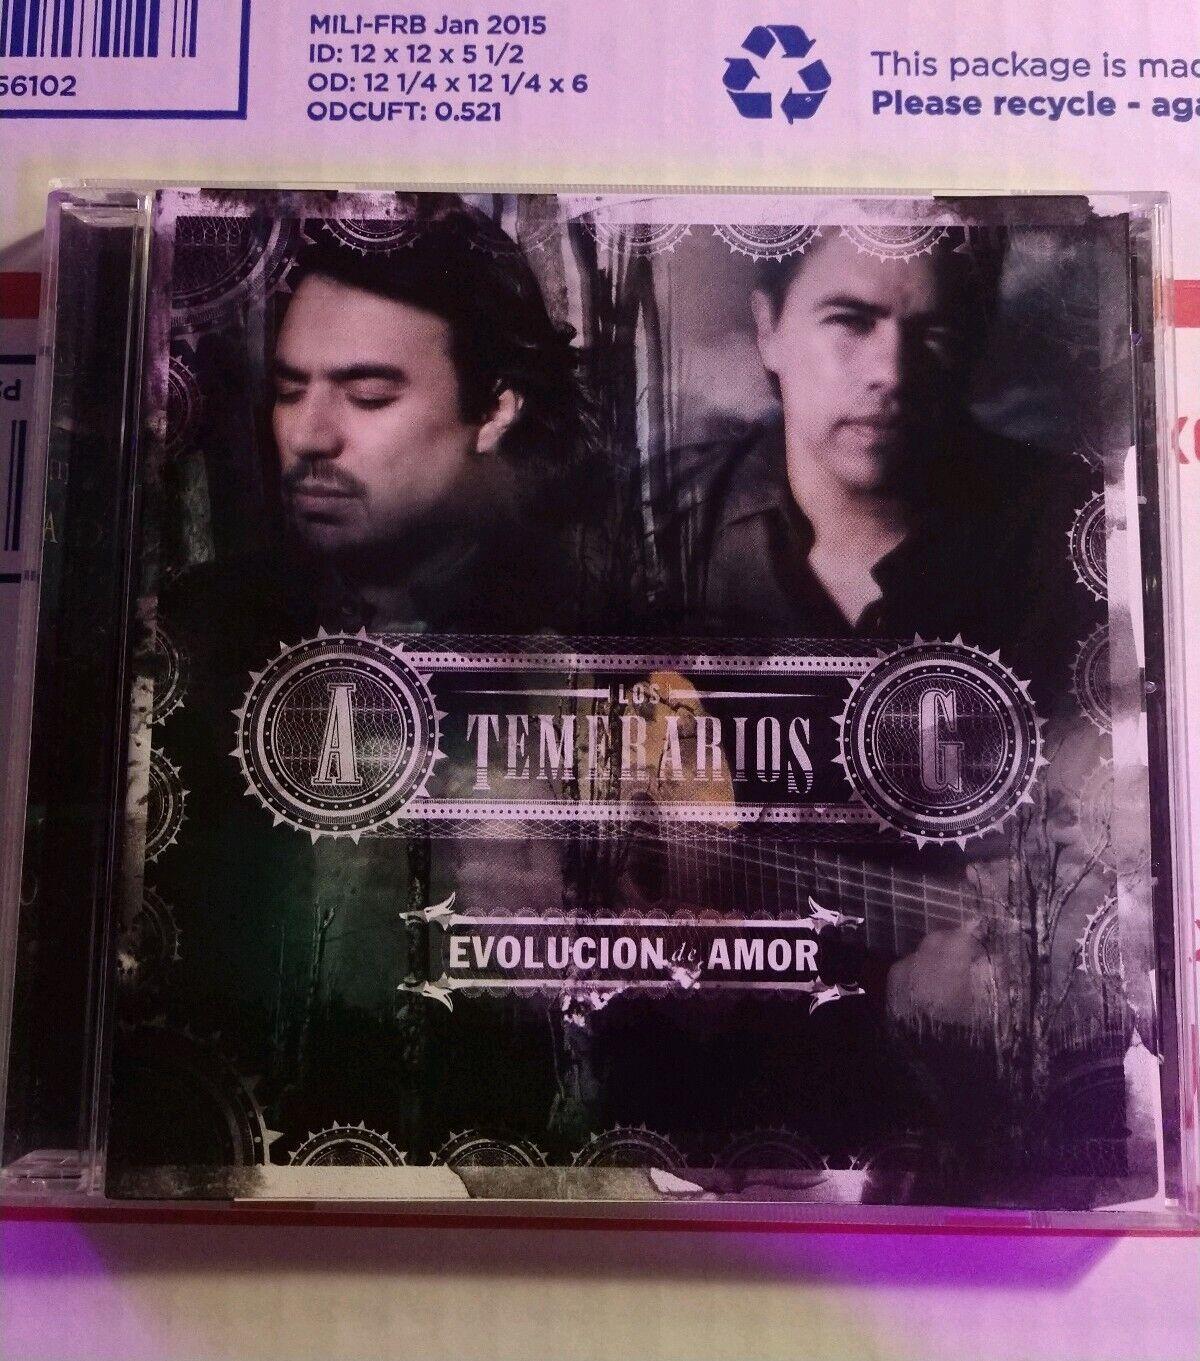 Amor En Fin Movie Online los temerarios evolucion de amor cd 2008 latin fonovisa mexico like  new!!!!!!!!!